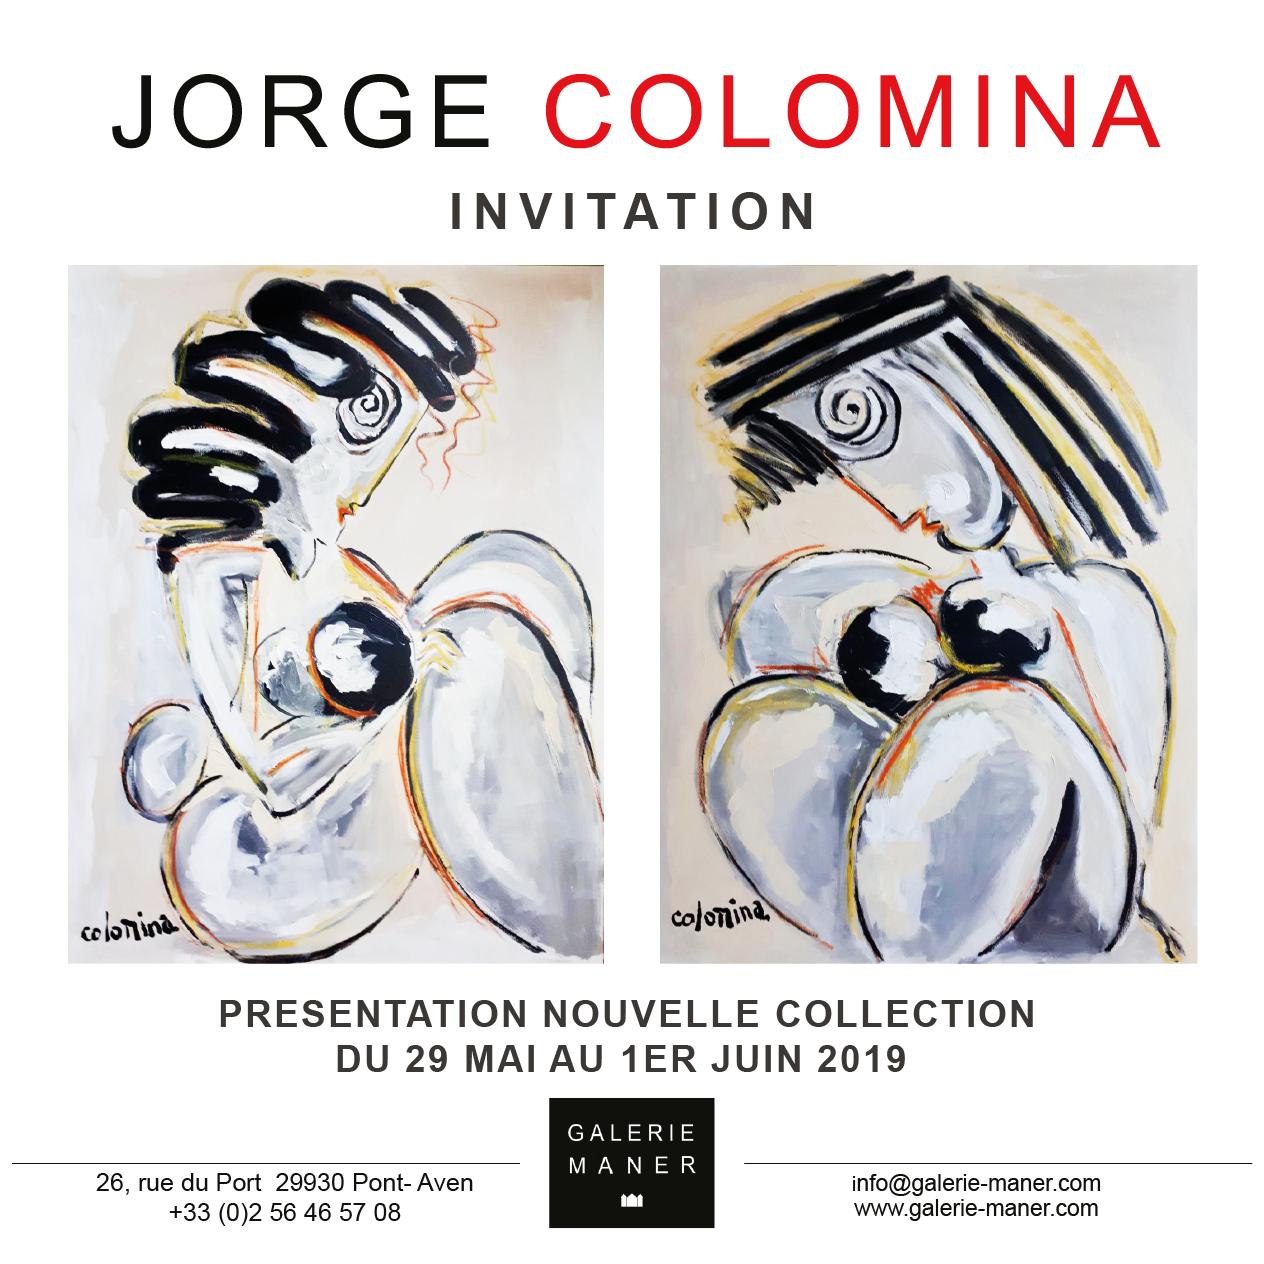 superbe exposition à pont aven figuratif abstrait nouvelle collection Jorge Colomina Galerie Maner 2019